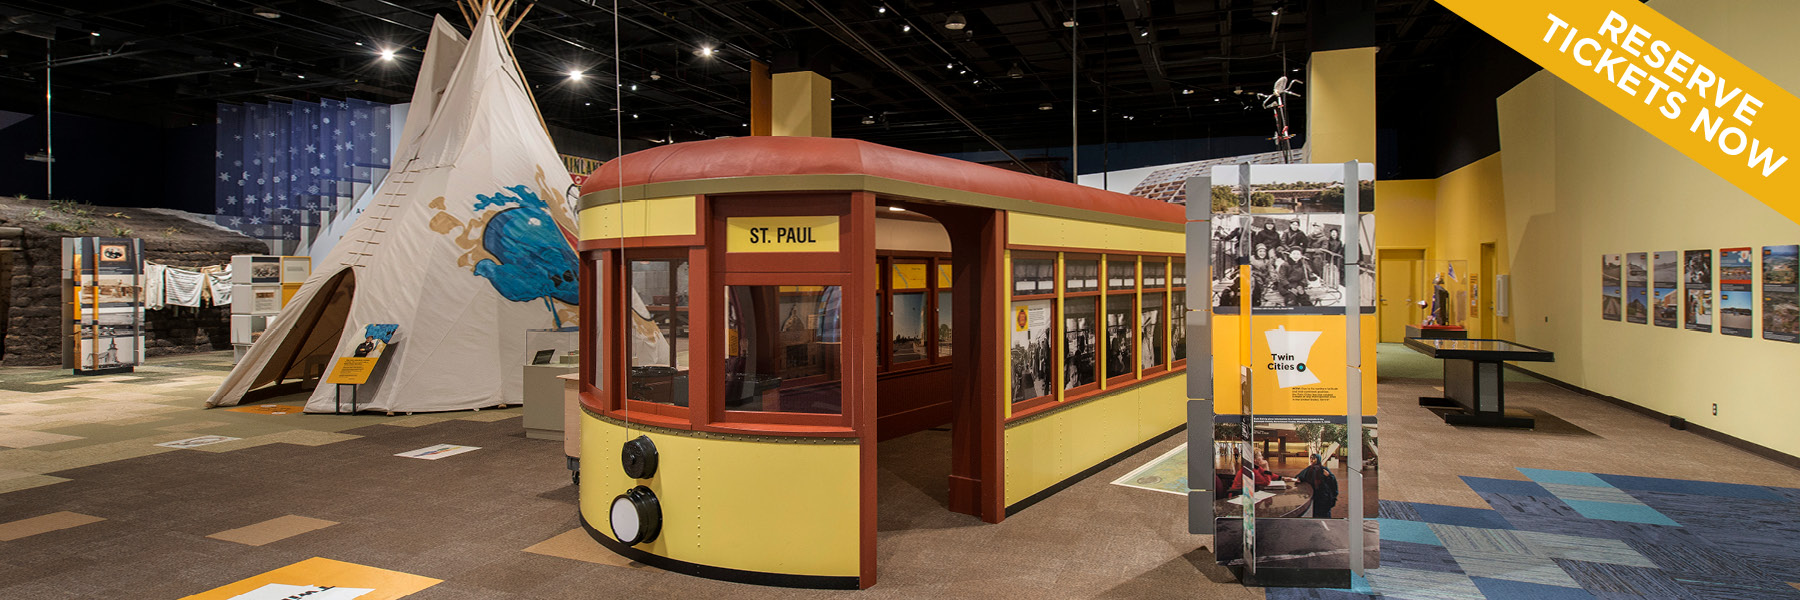 Minnesota History Center Museum now open.